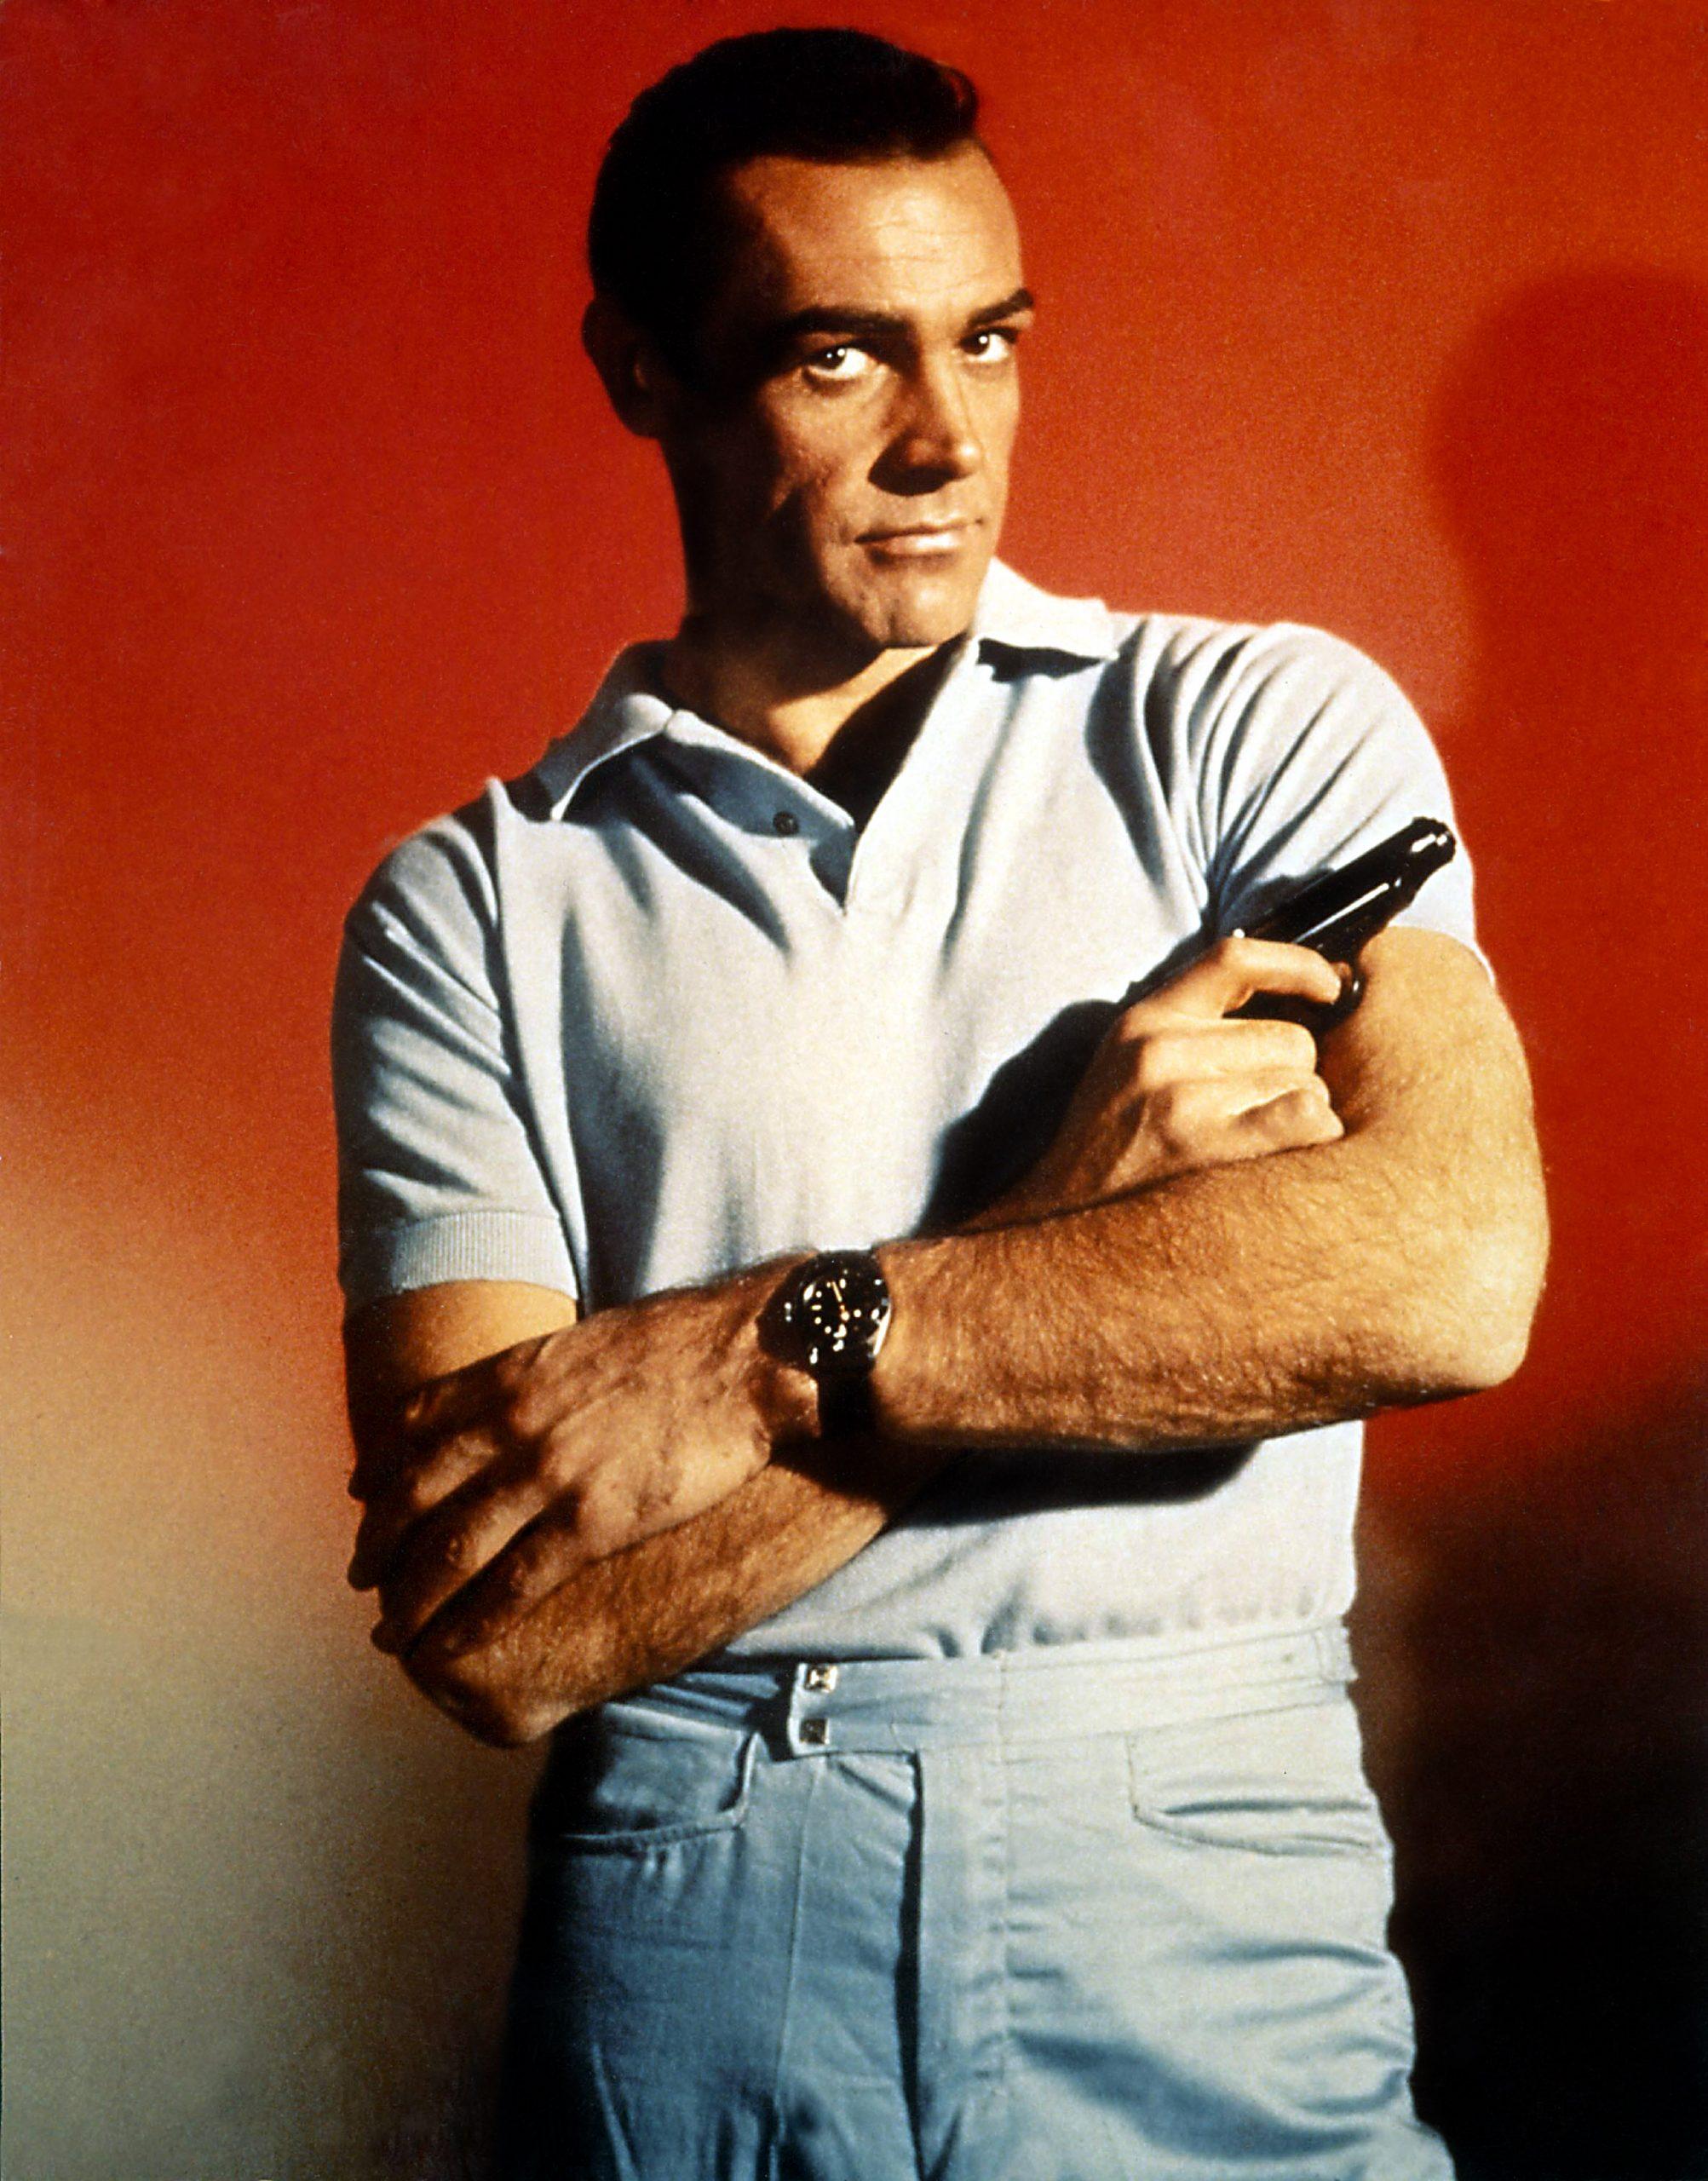 Still shot of Sean Connery holding a pistol as 007.